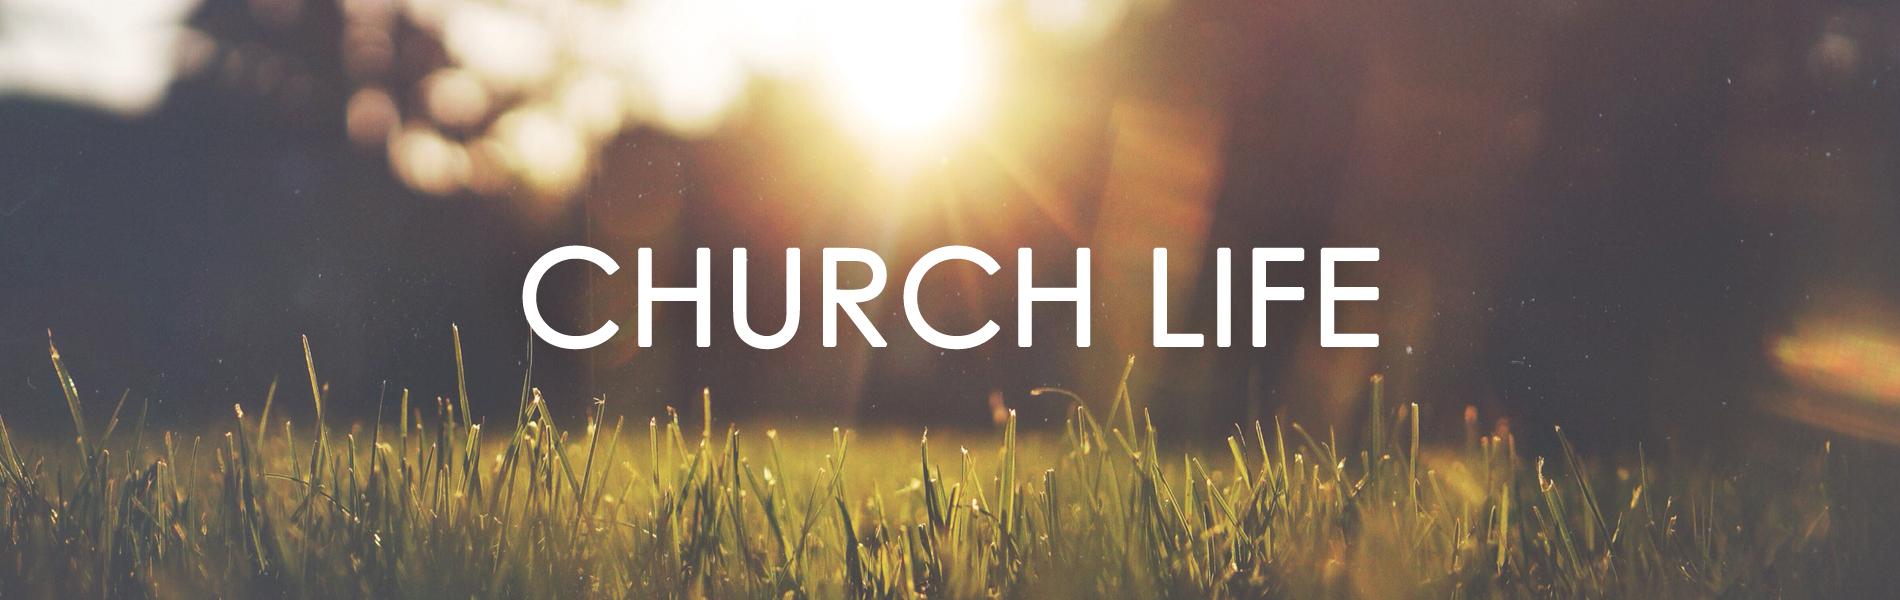 Church Life2